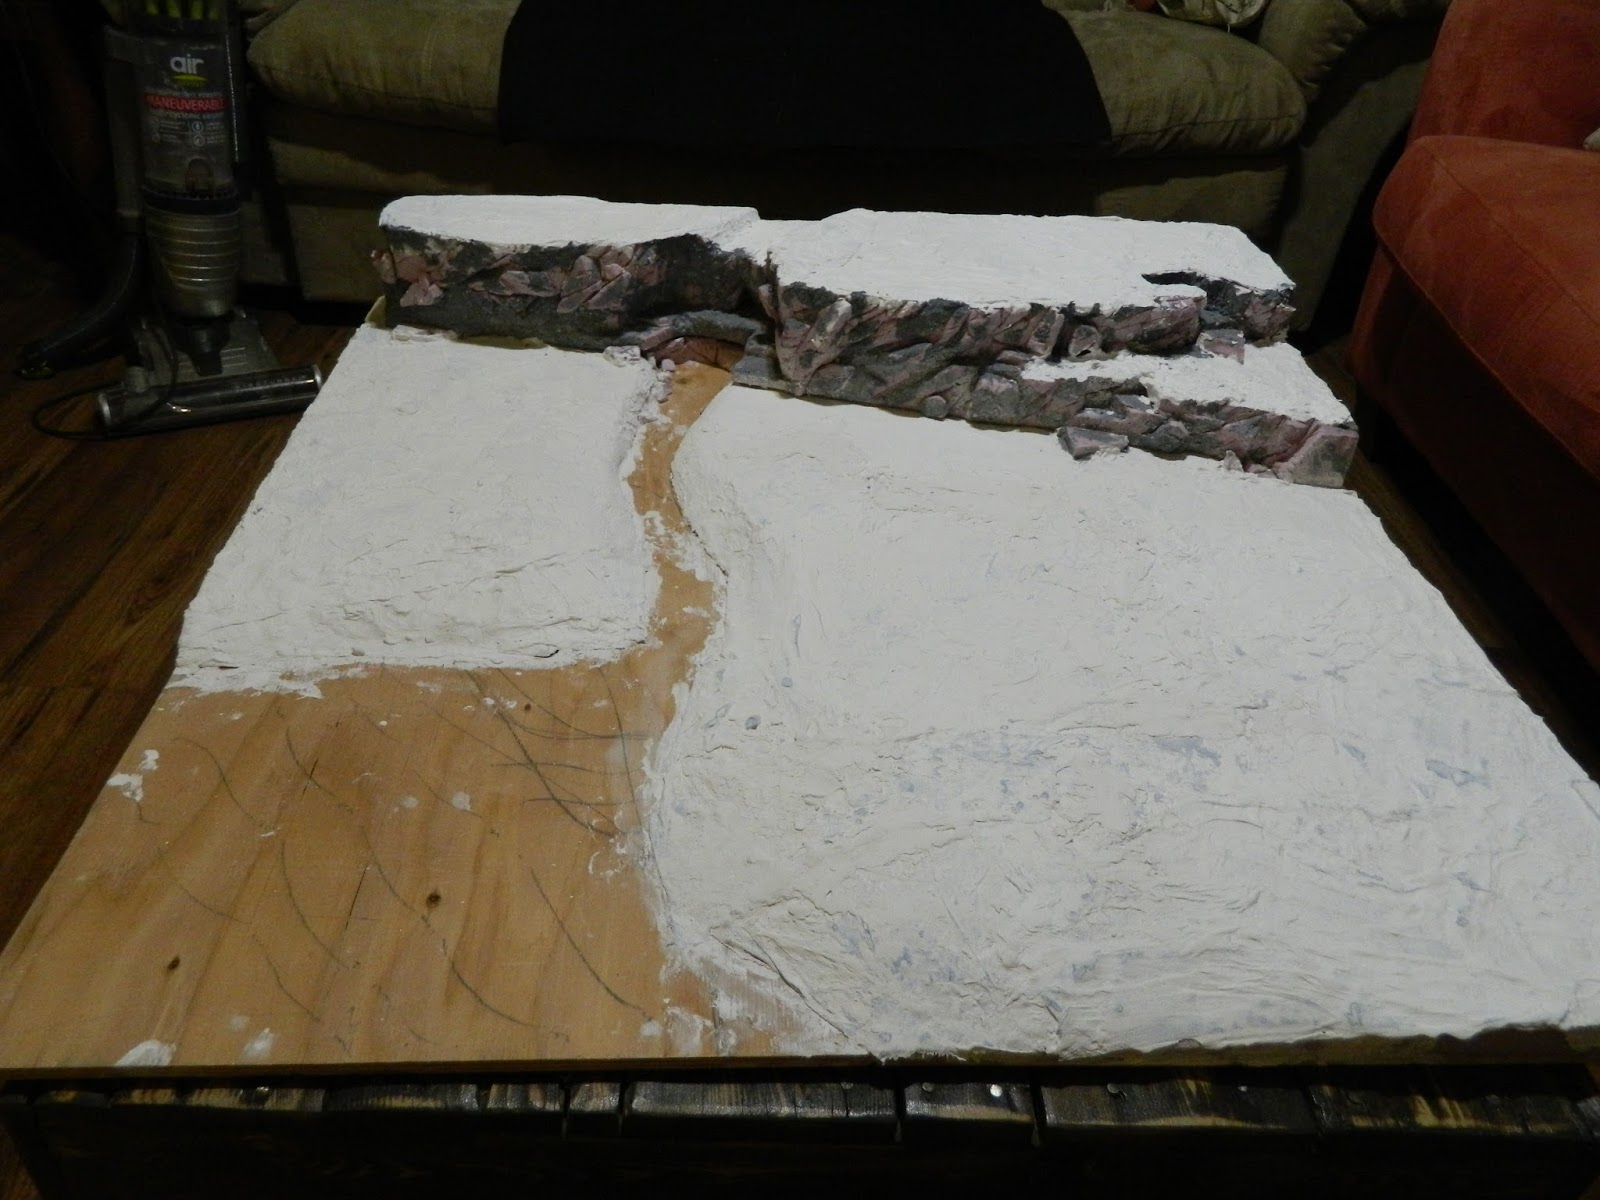 Not exactly Mordheim terrain Pulp%2BAlley%2BTable%2B1%2BNov%2B4%2B005